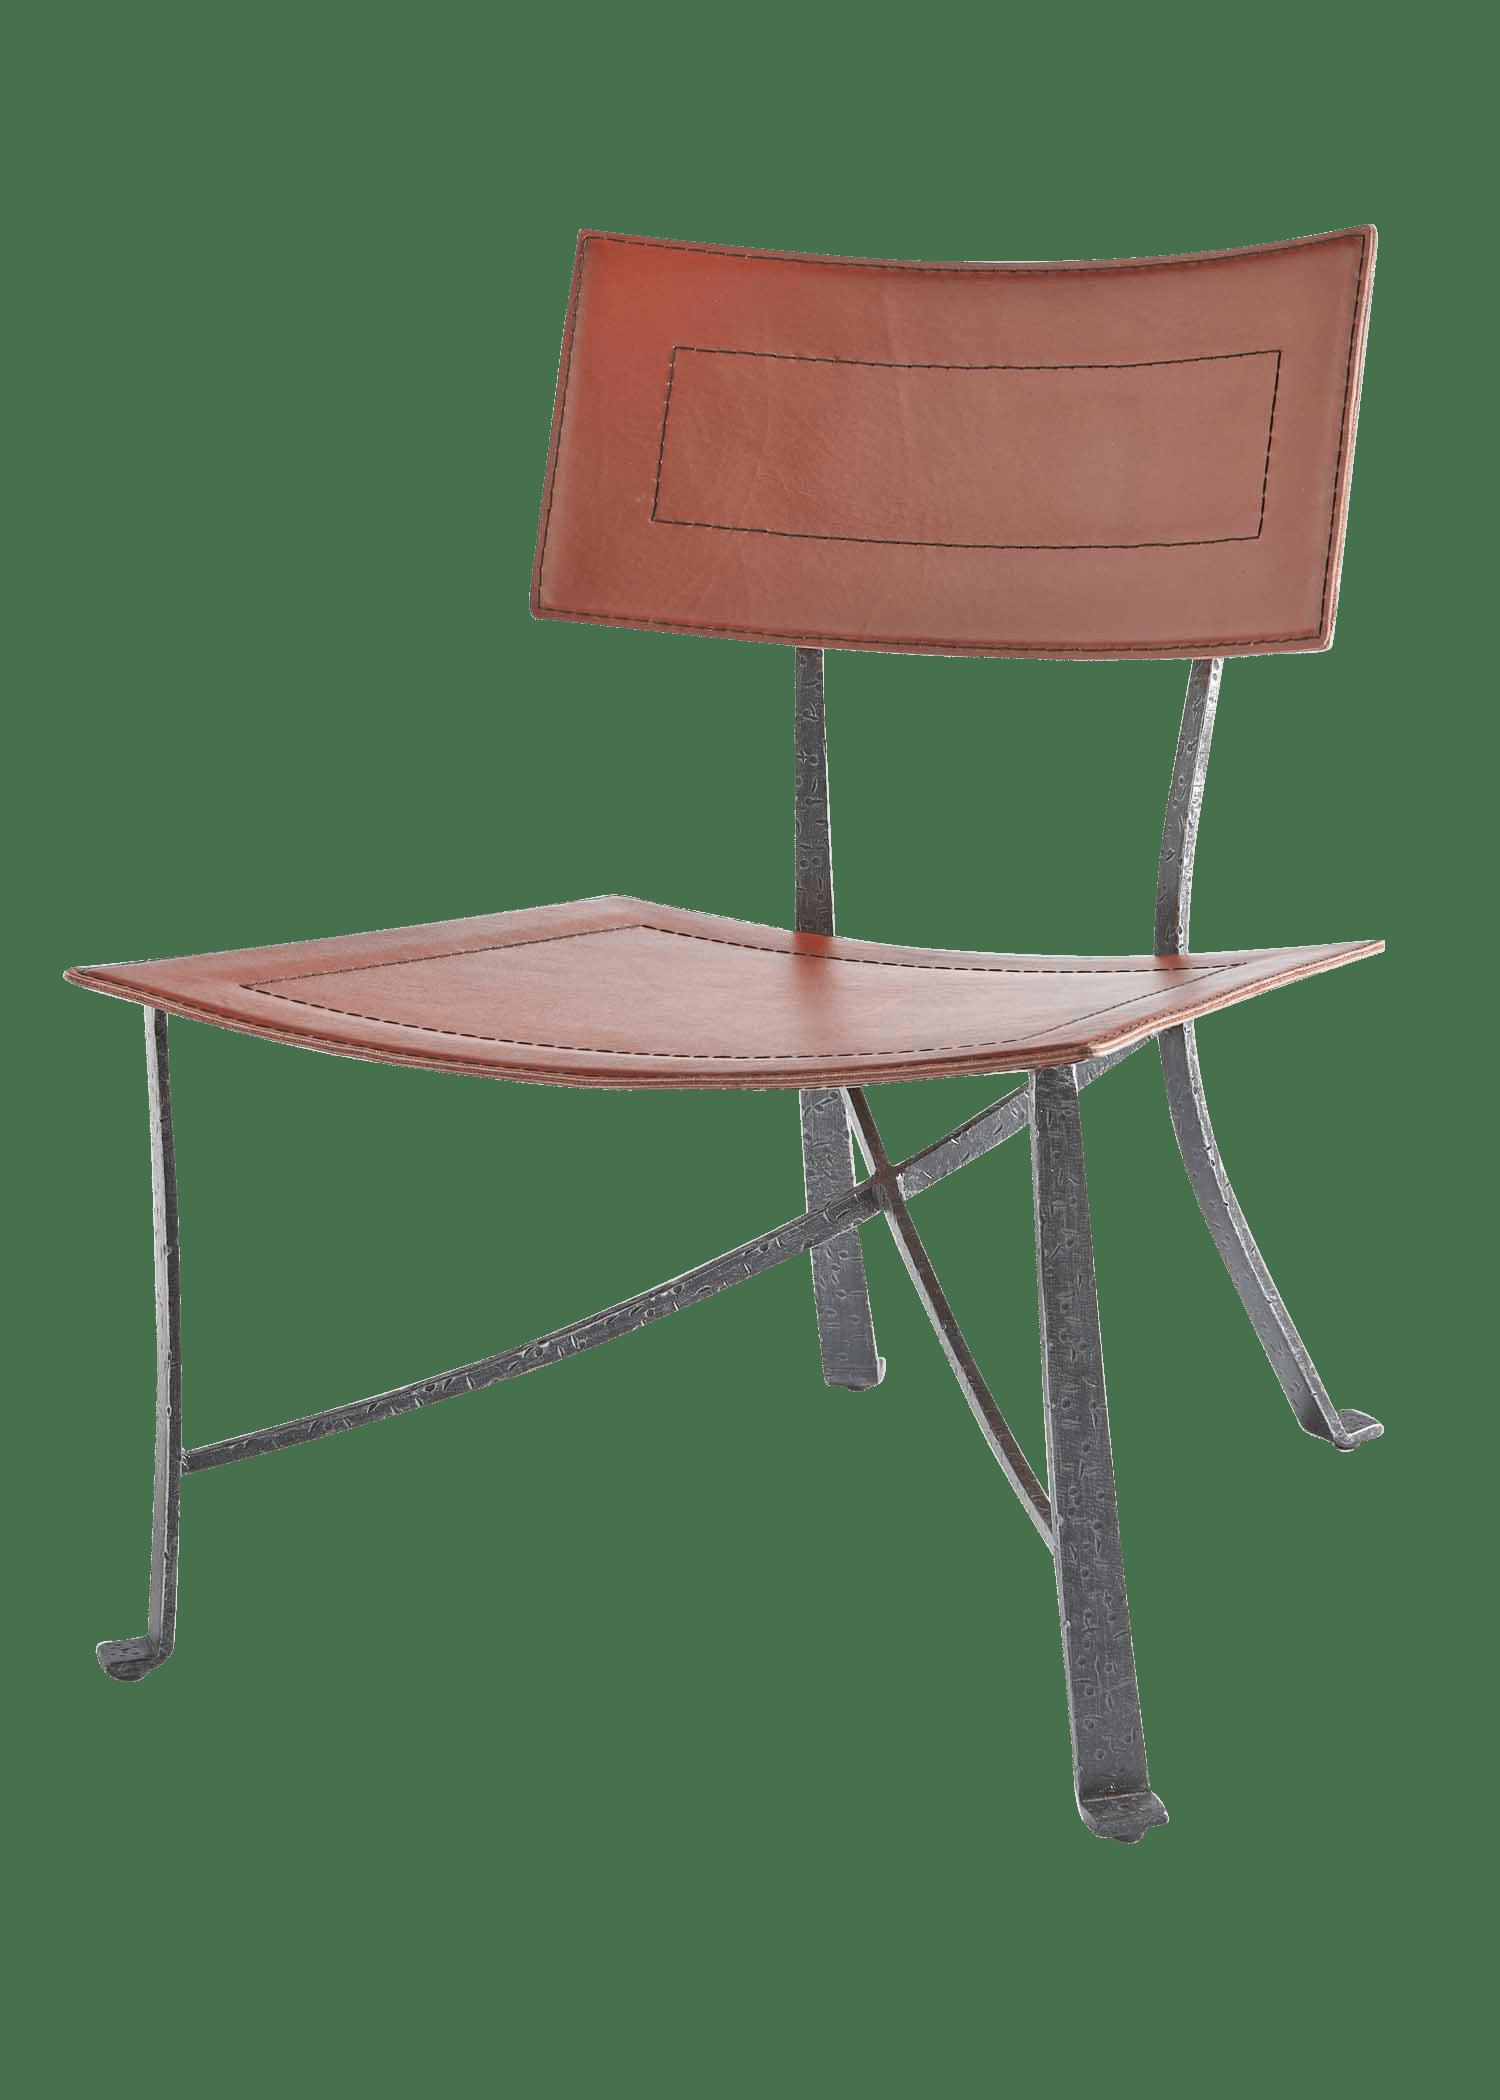 chair design iron best canopy selamat designs klismos wrought lounge w stool